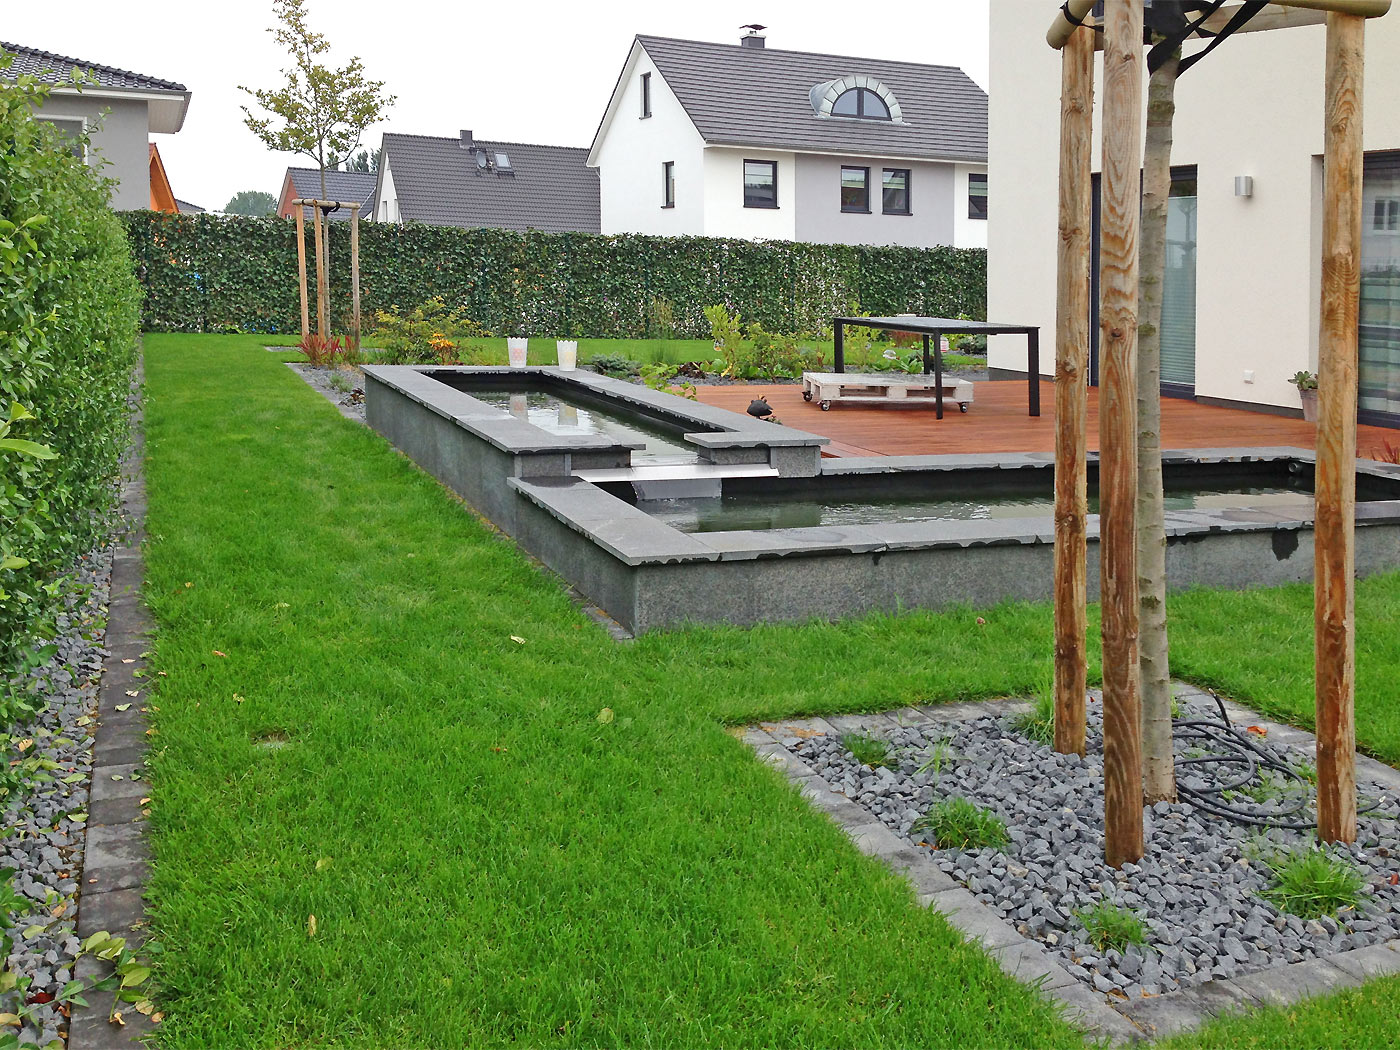 Outdoorküche Garten Rostock : Gartenpflanzen rostock